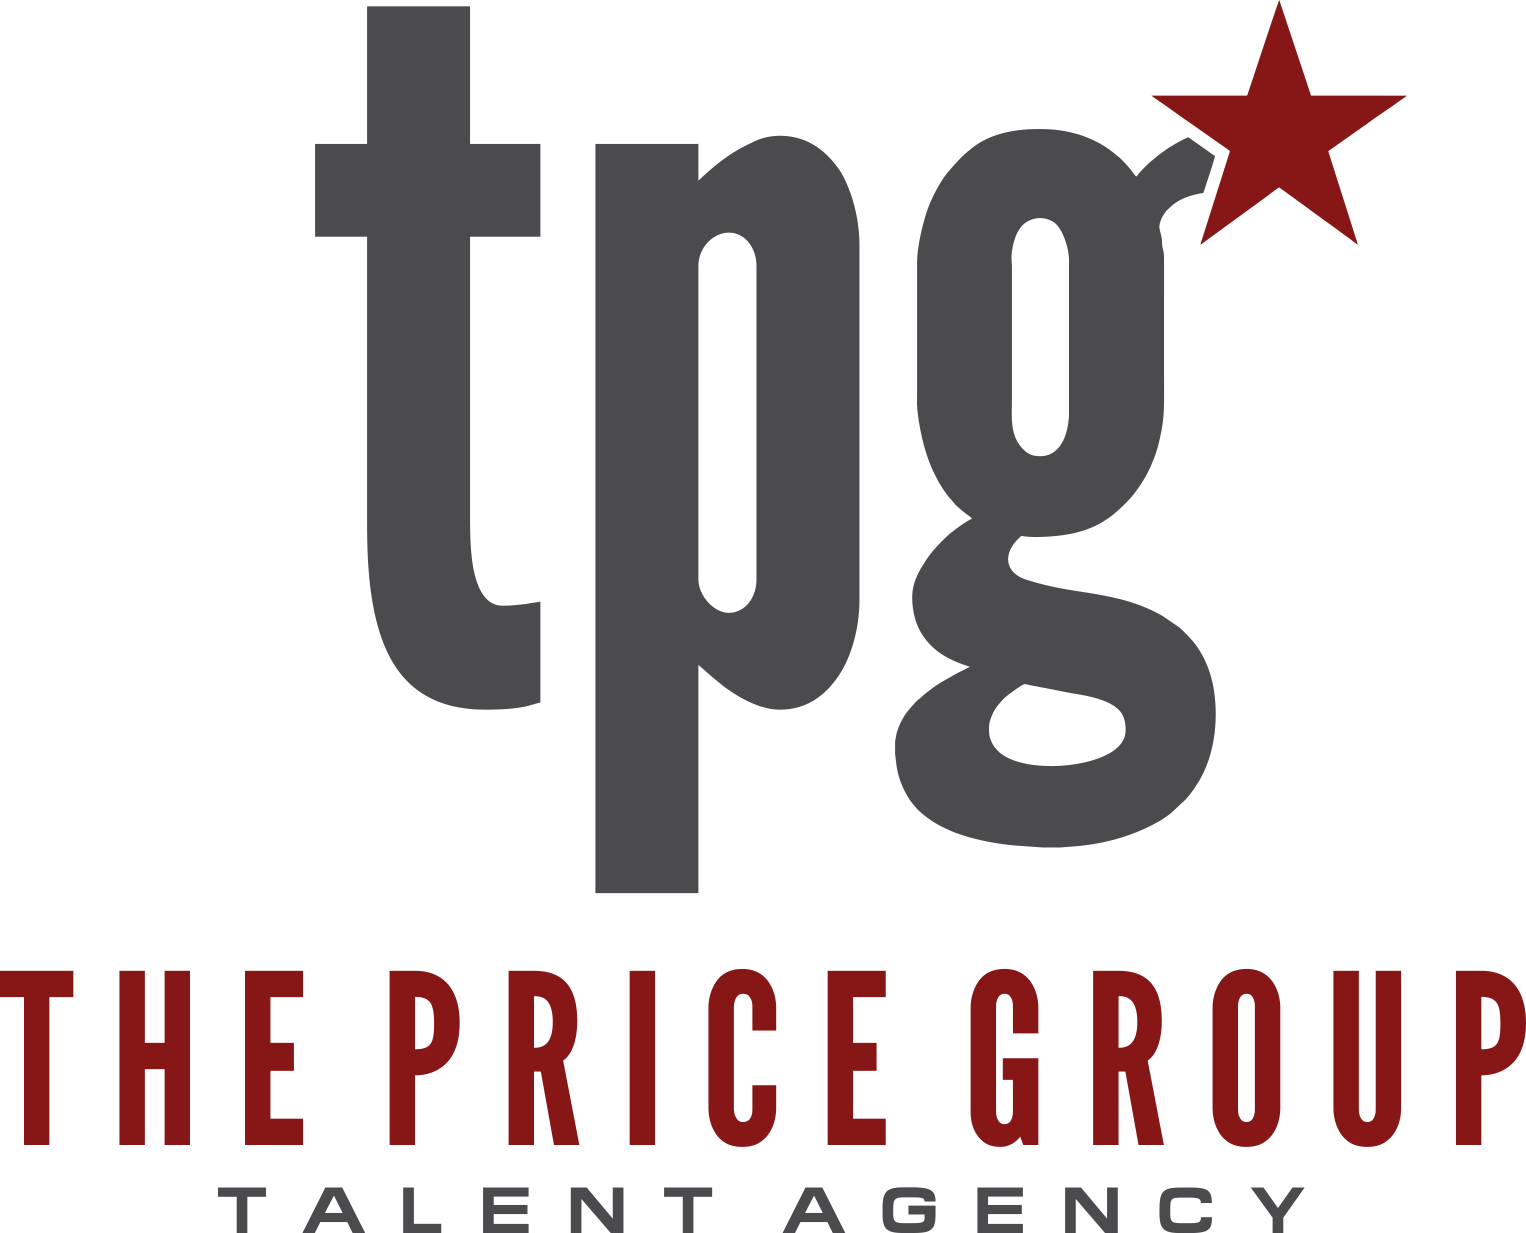 The Price Group's logo